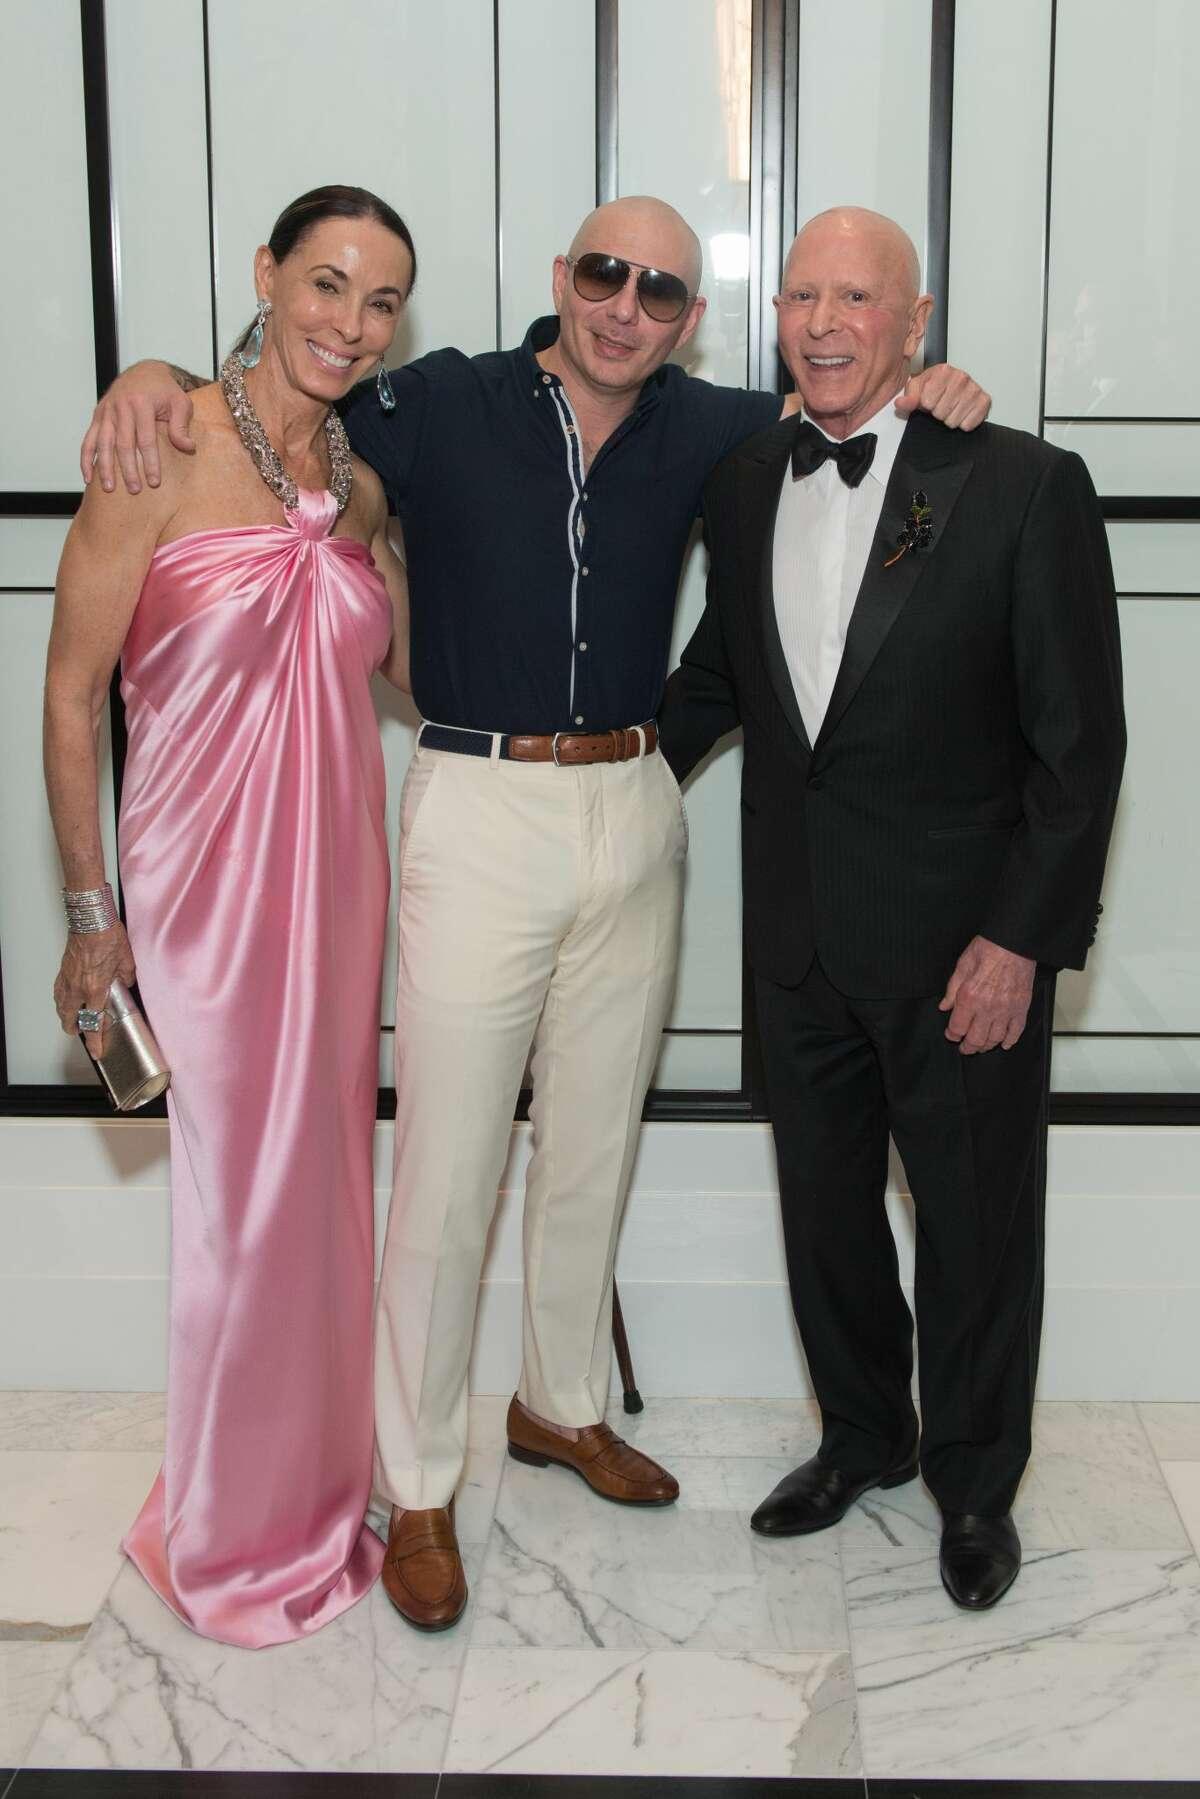 Sue Smith, Pitbull, and Lester Smith